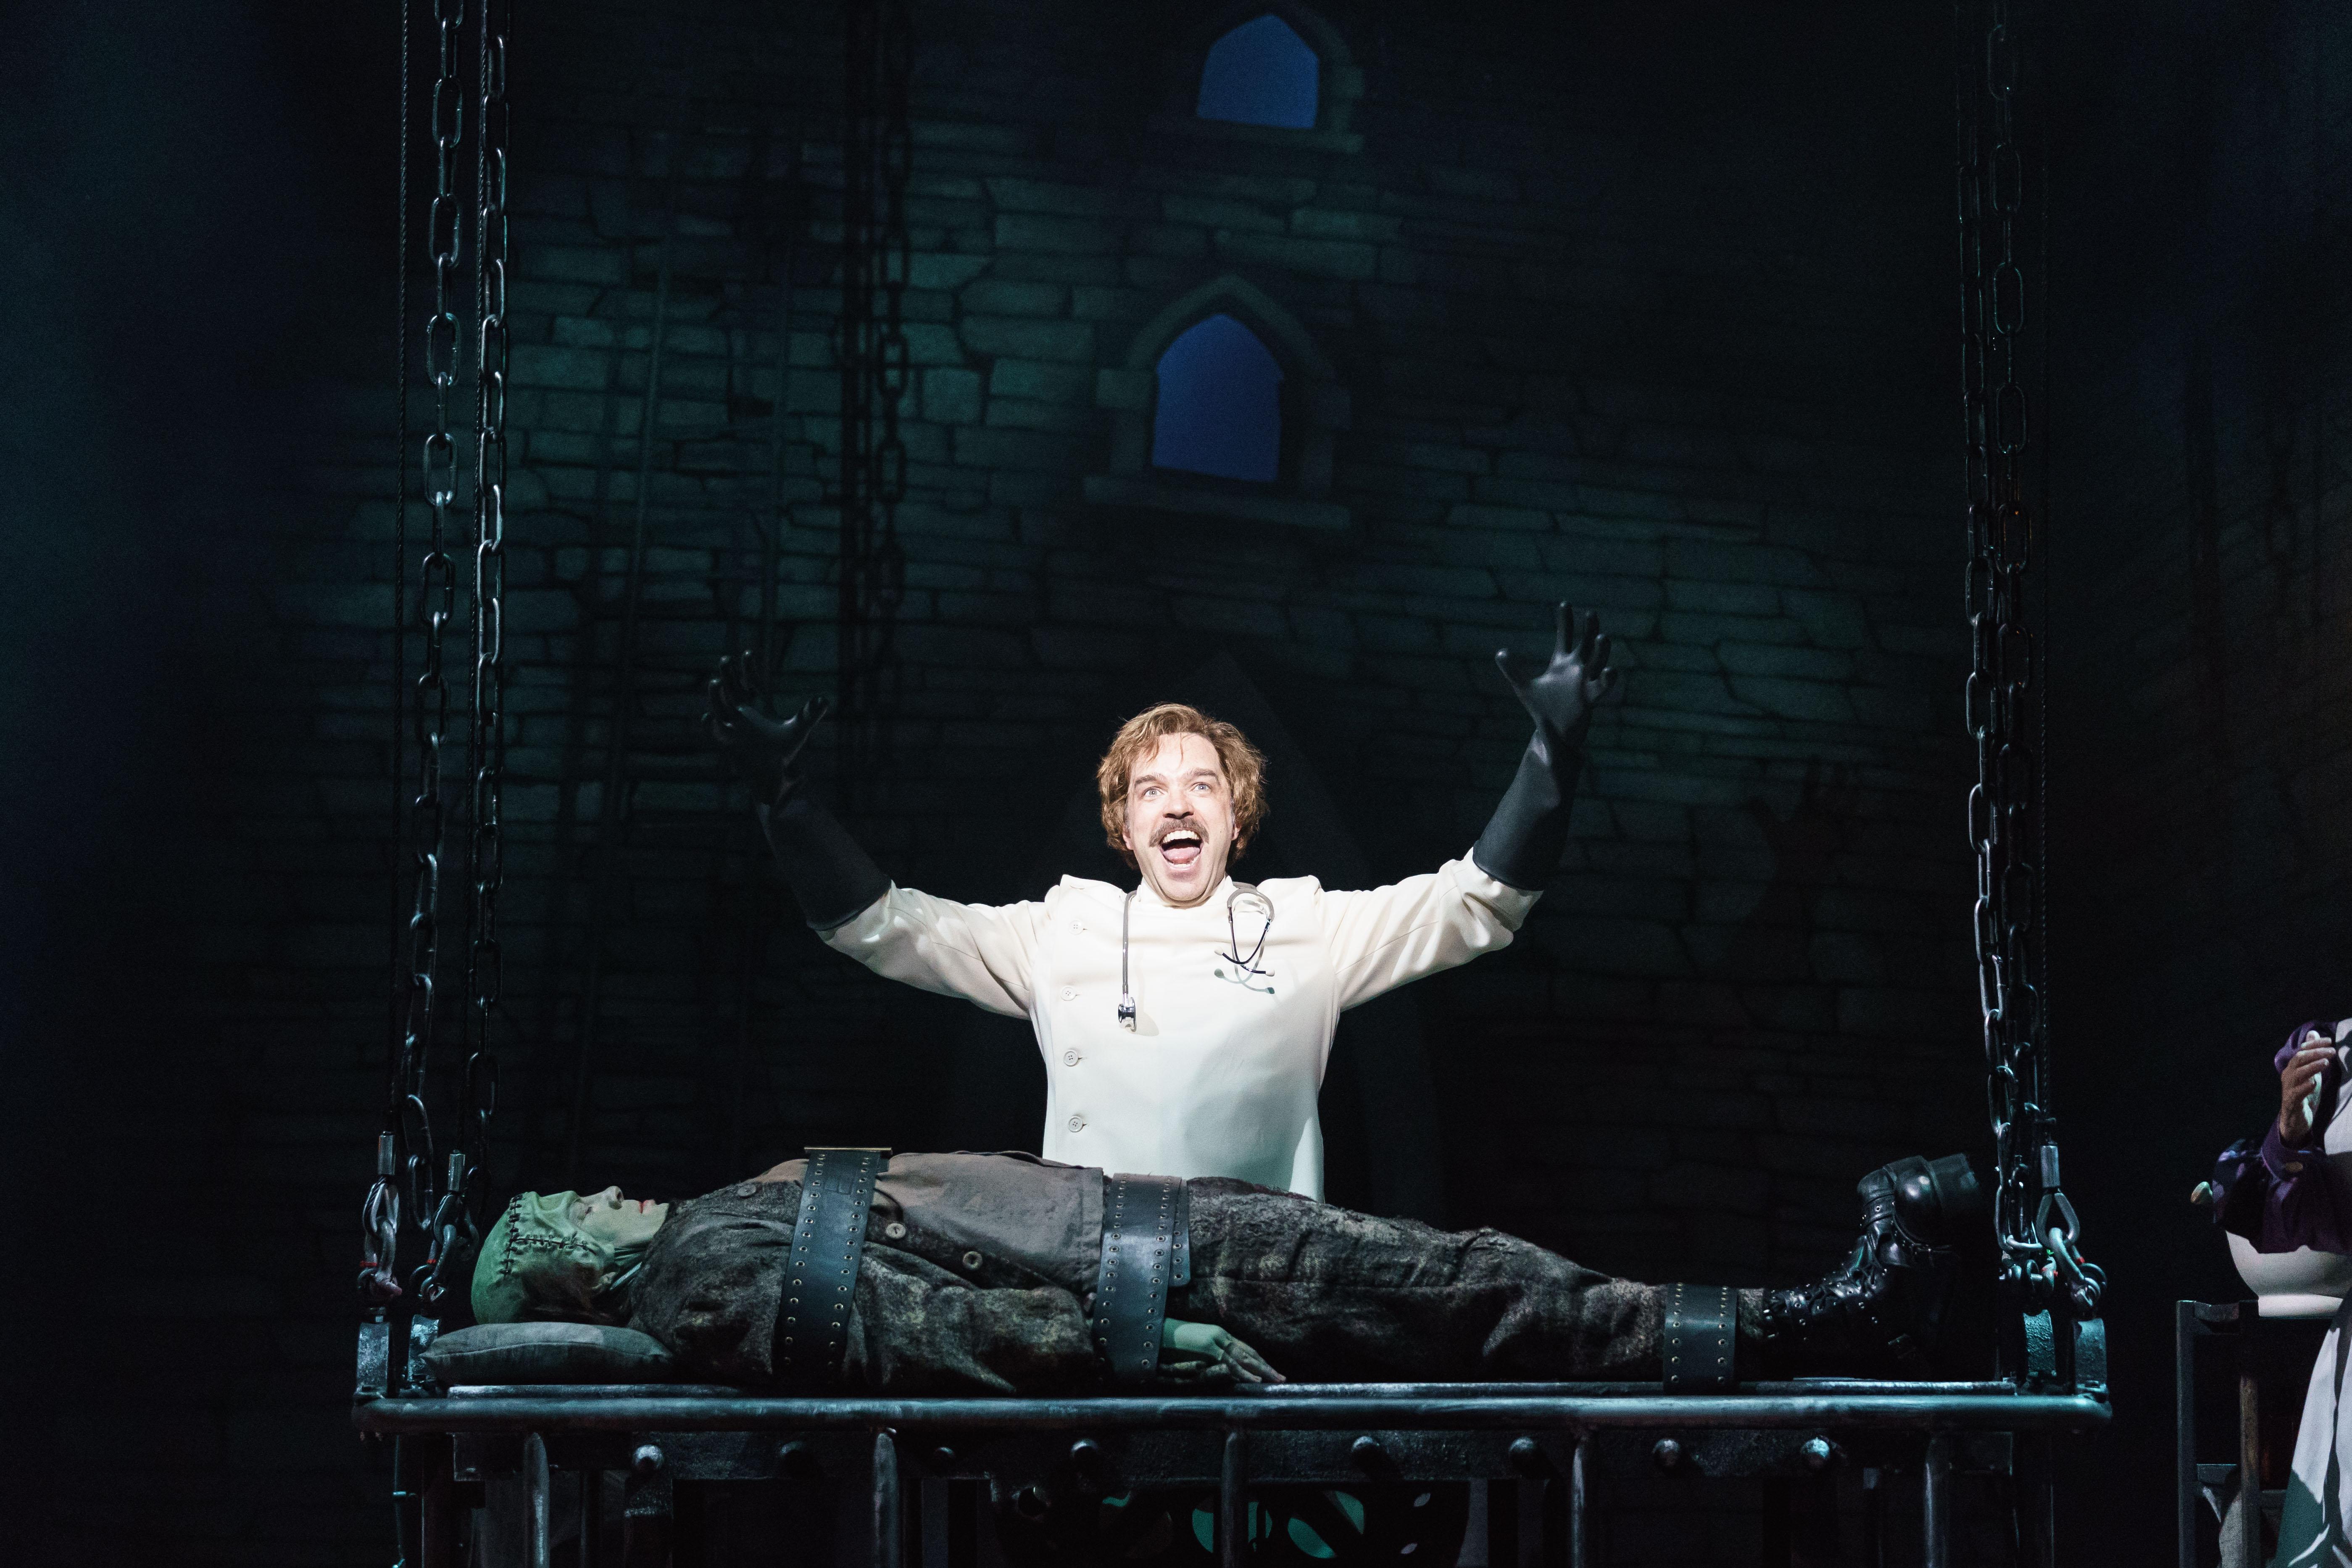 BWW Review: YOUNG FRANKENSTEIN, Garrick Theatre